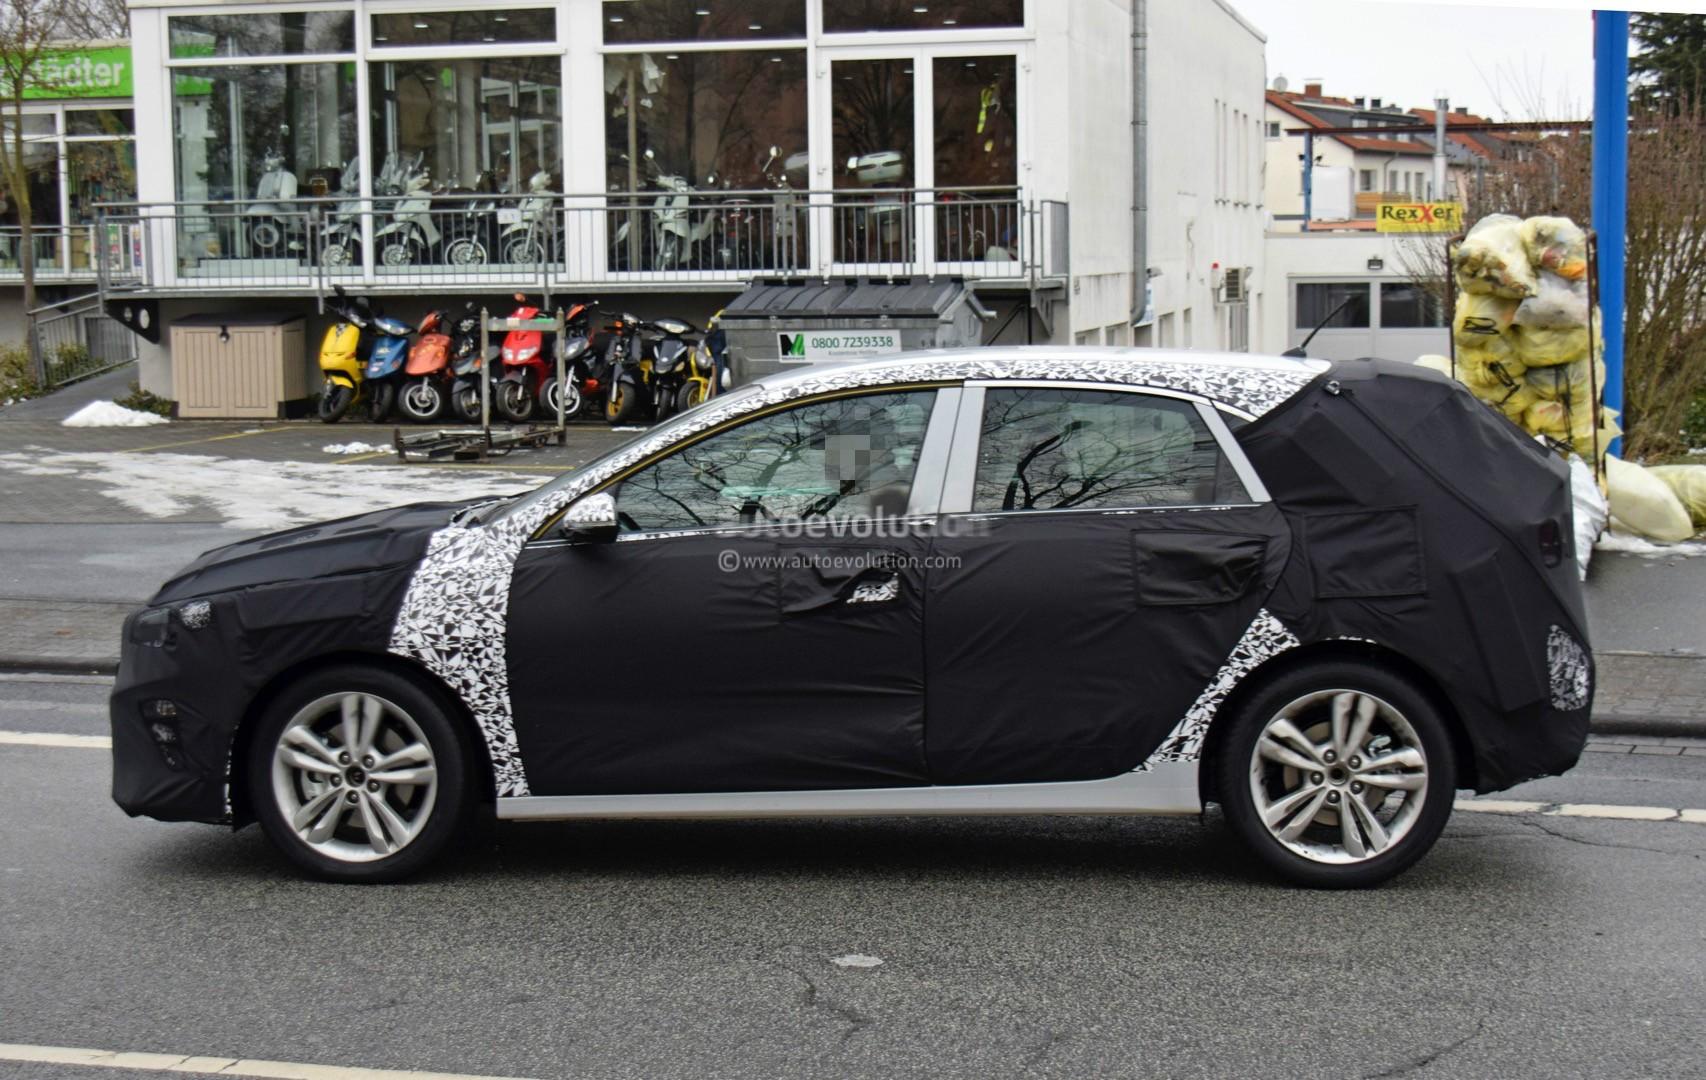 2018 Kia Cee'd Caught On Video Next To New Hyundai i30 And ...